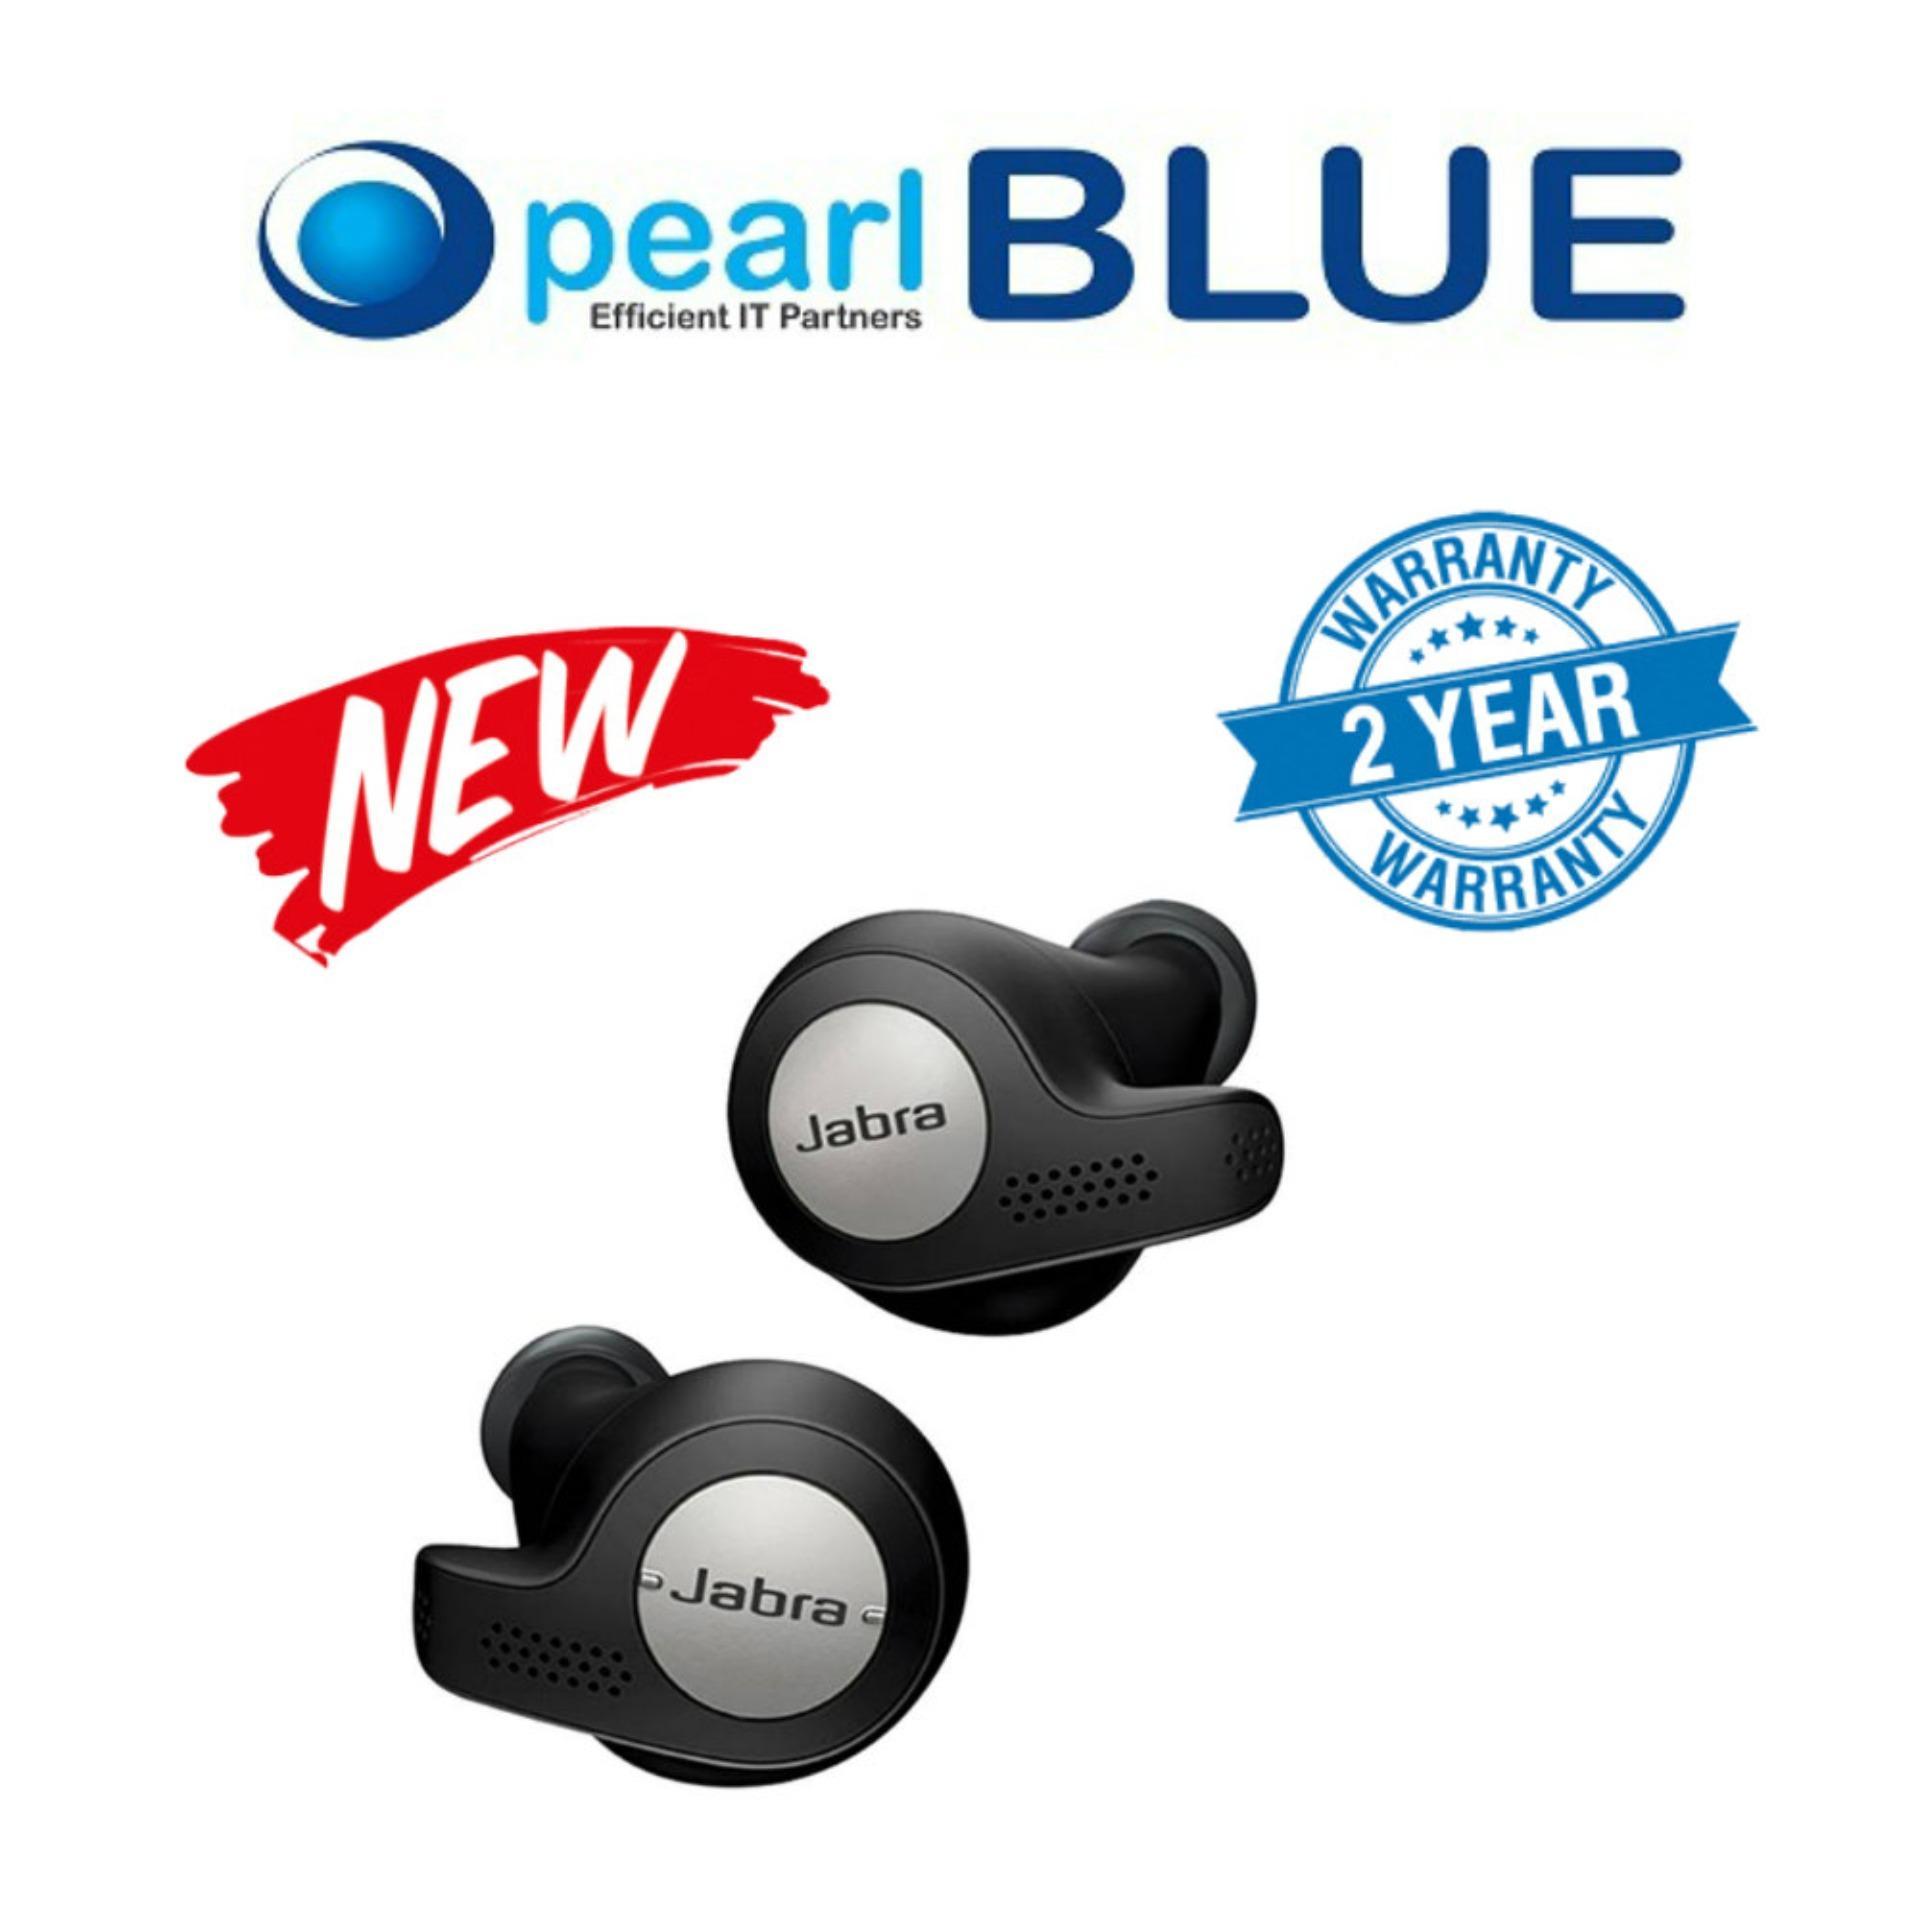 Latest Jabra Wireless Earbuds Products | Enjoy Huge Discounts